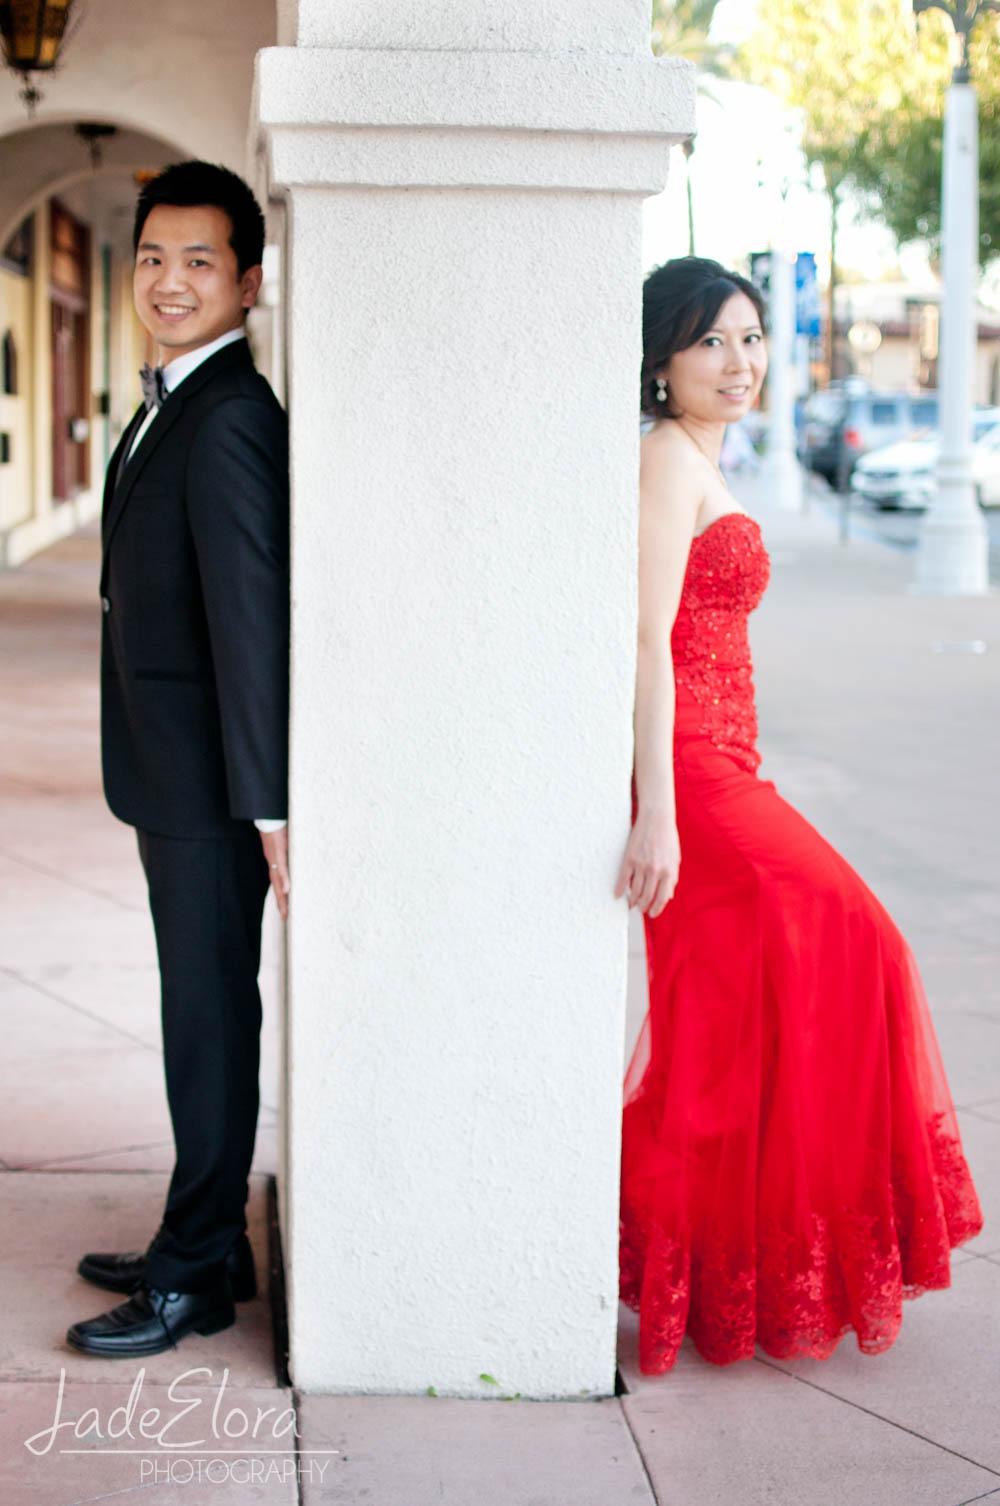 JadeEloraPhotography-Blog-Engagement-Weddings-37.jpg